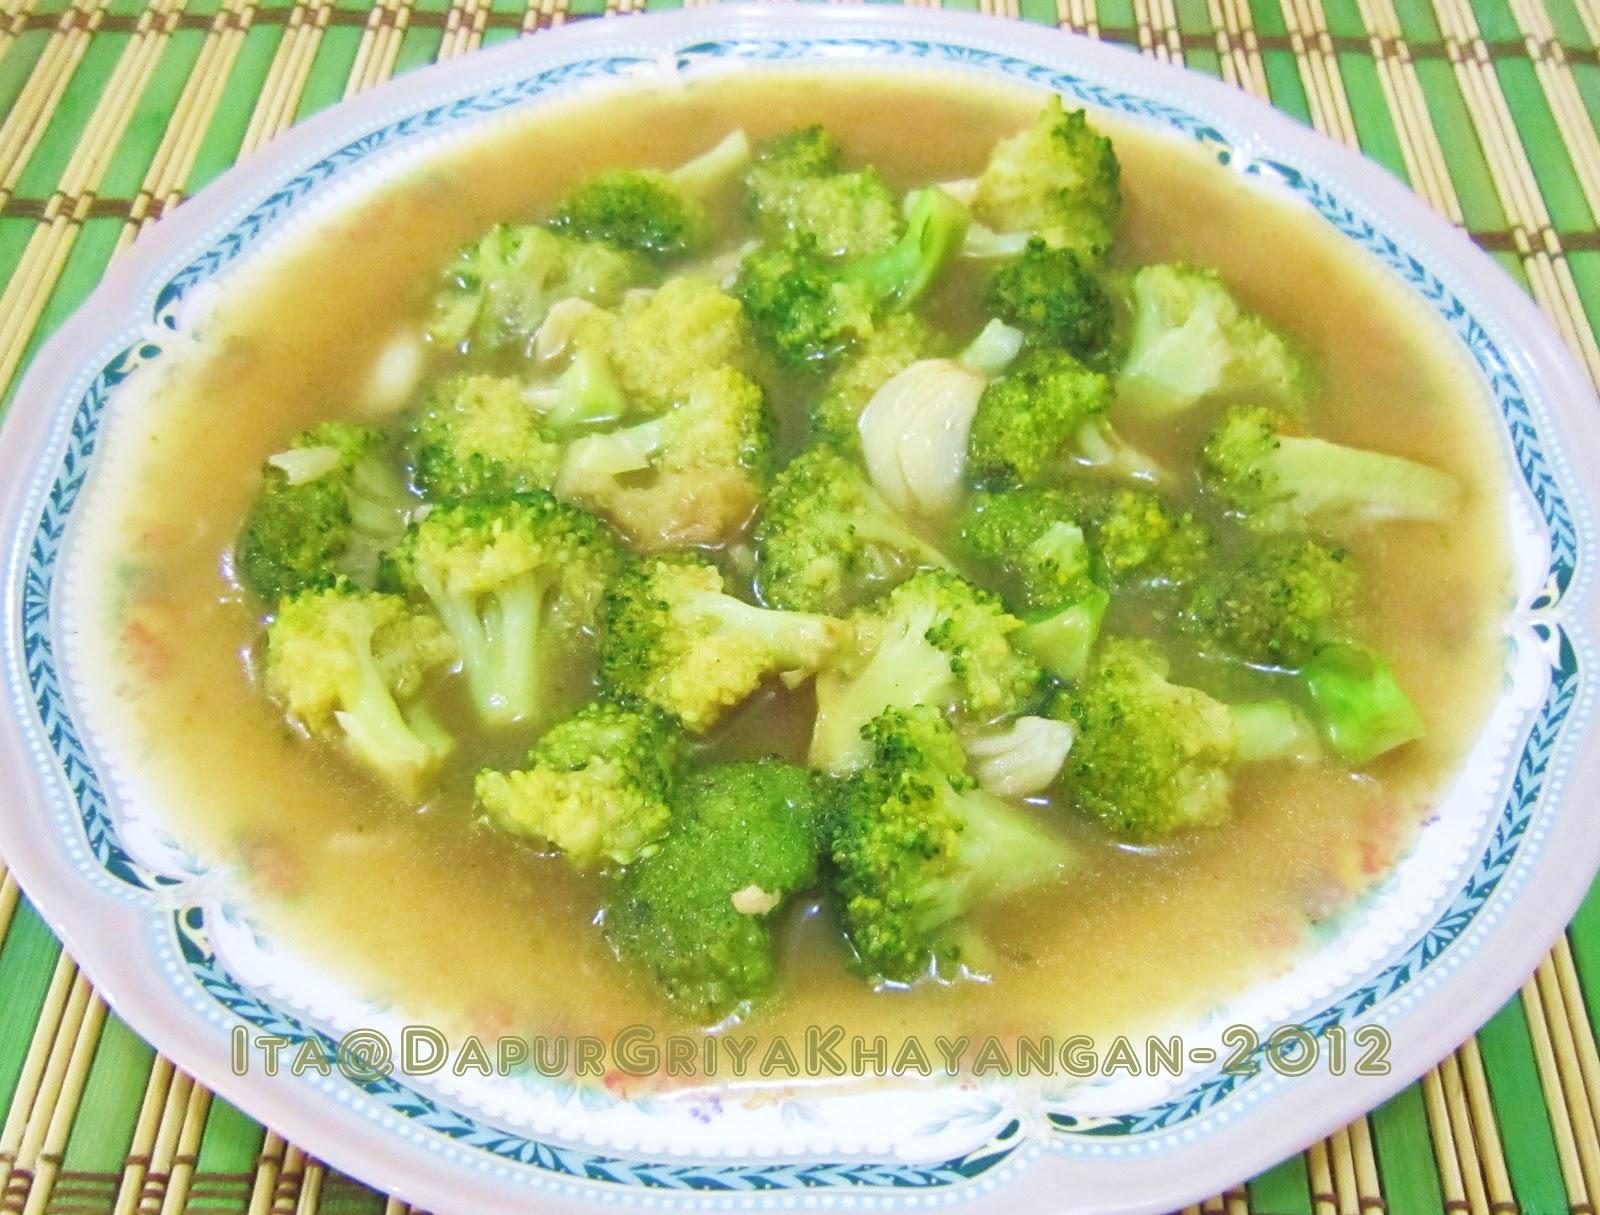 Dapur Griya Khayangan Cah Brokoli Saos Tiram